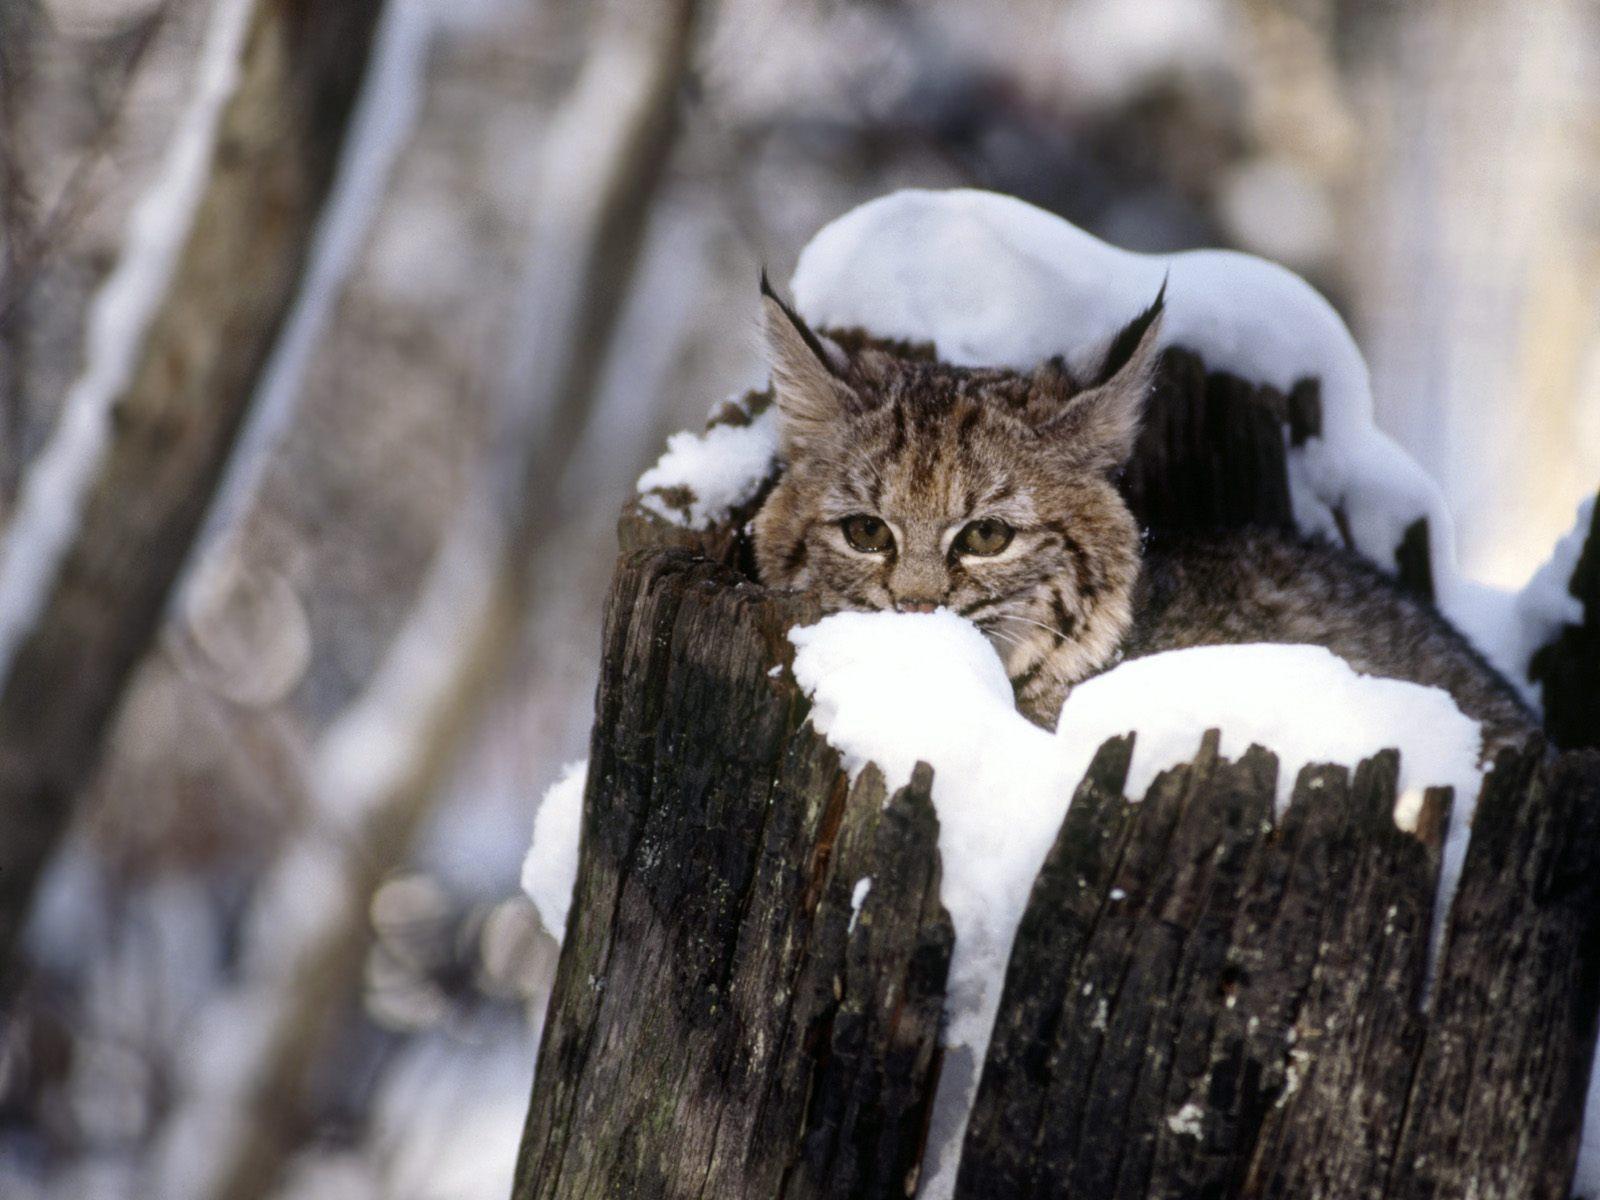 Drowsy Cat in a Tree Trunk